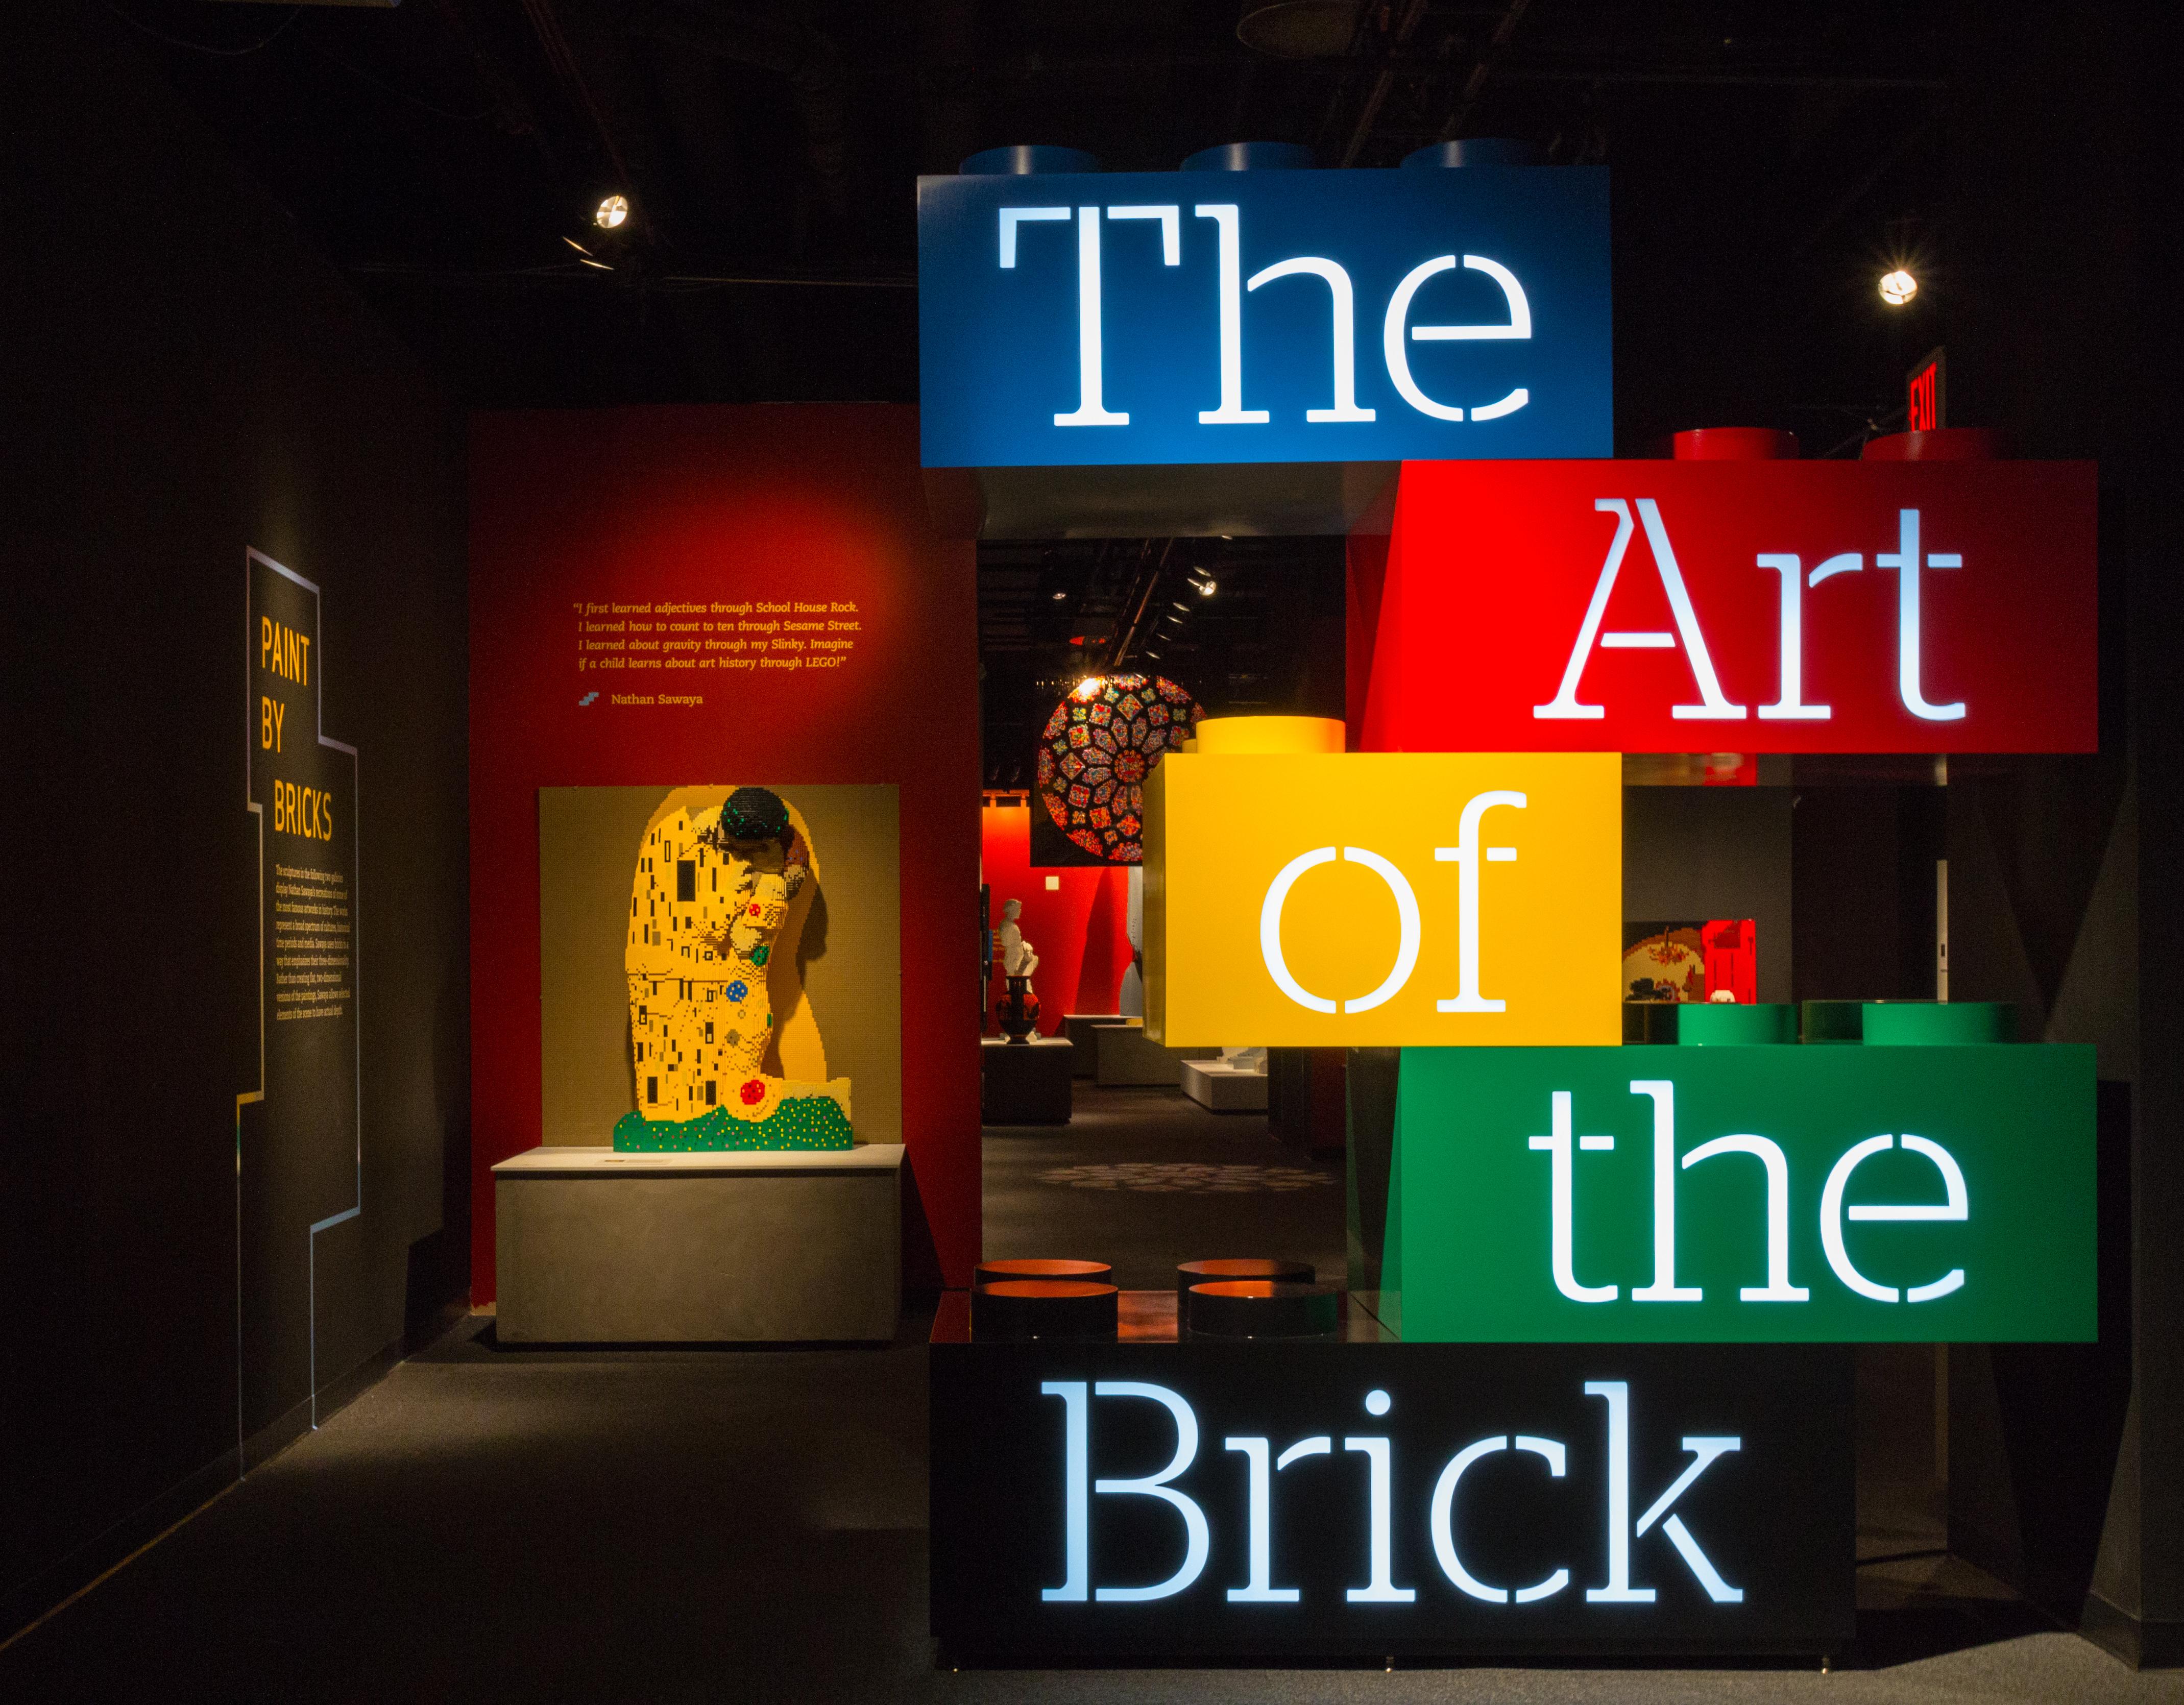 Wall Art The Brick : Art sawaya s lego sculptures more than another brick in